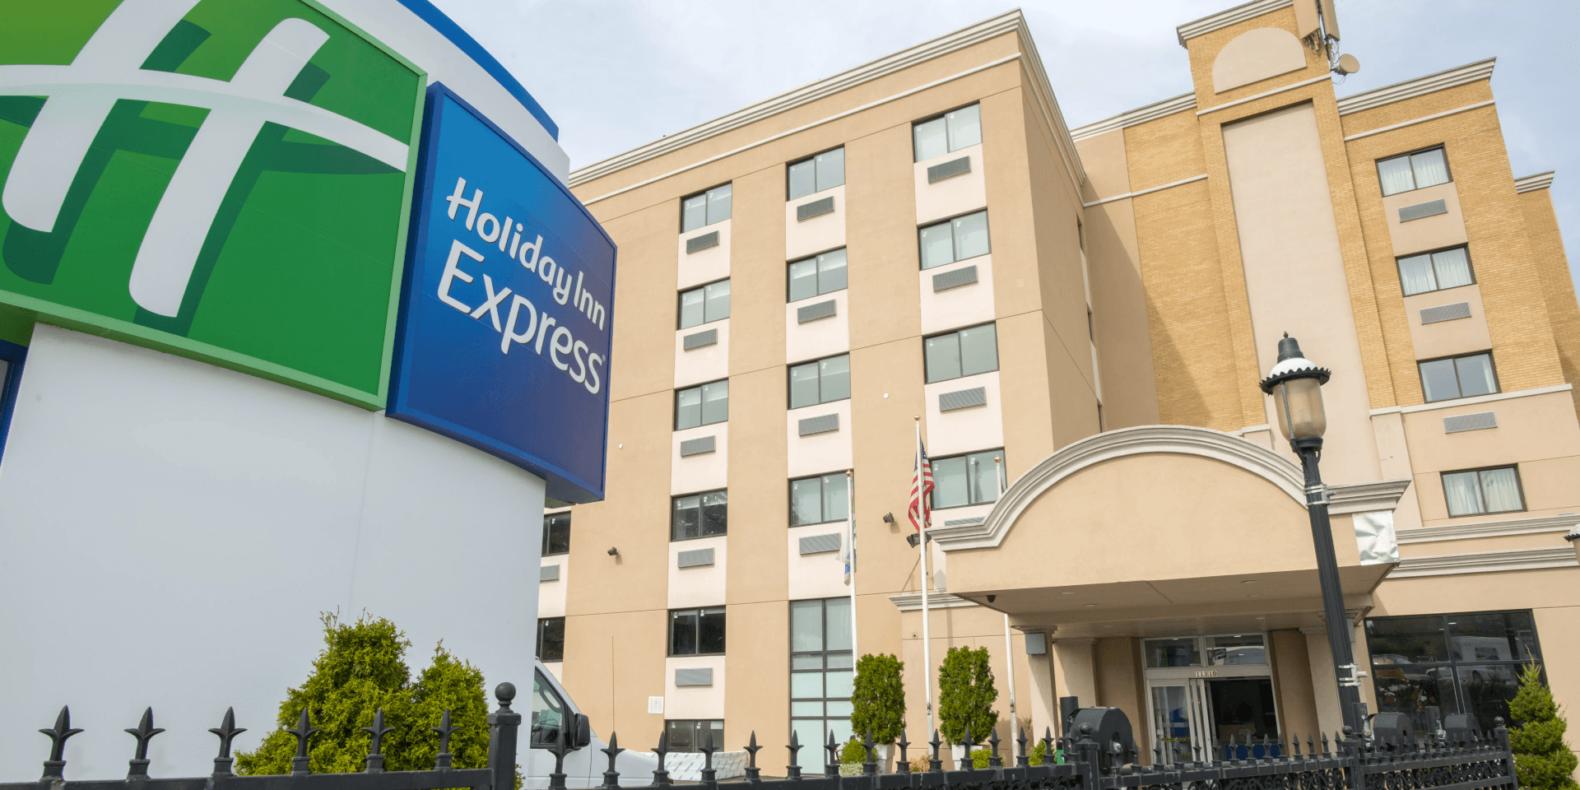 Holiday Inn Express LaGuardia Airport exterior and sign